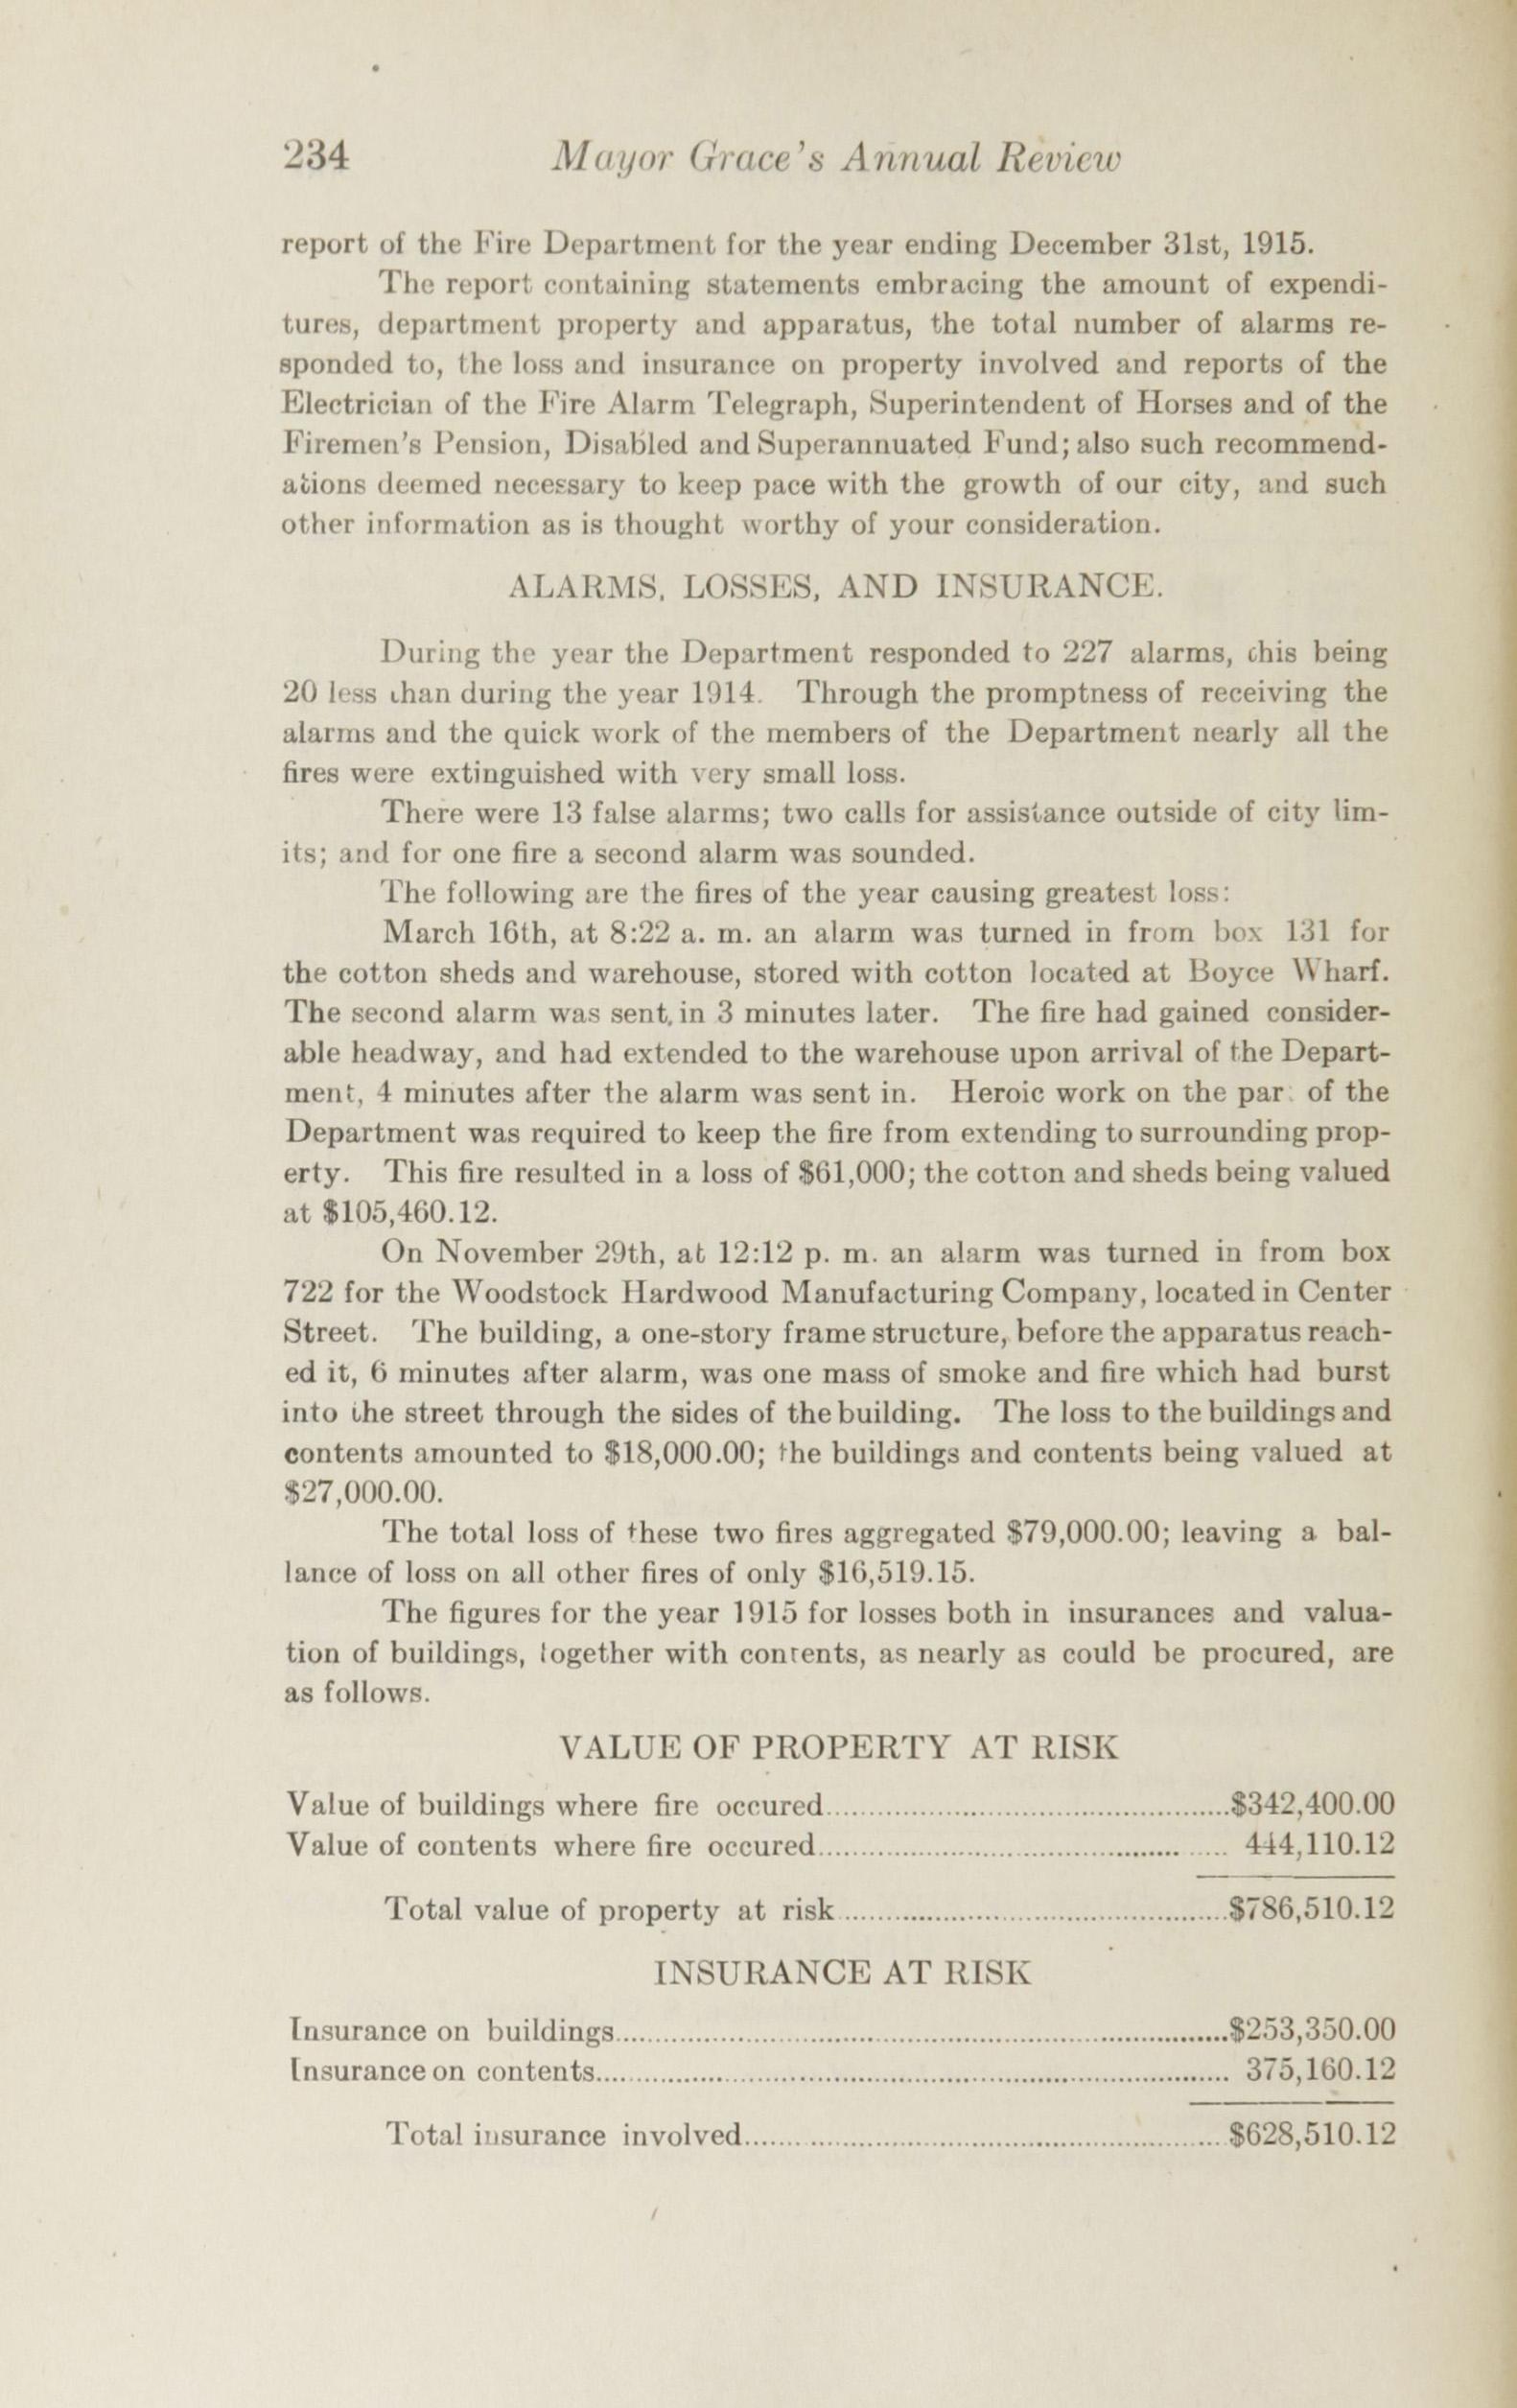 Charleston Yearbook, 1915, page 234